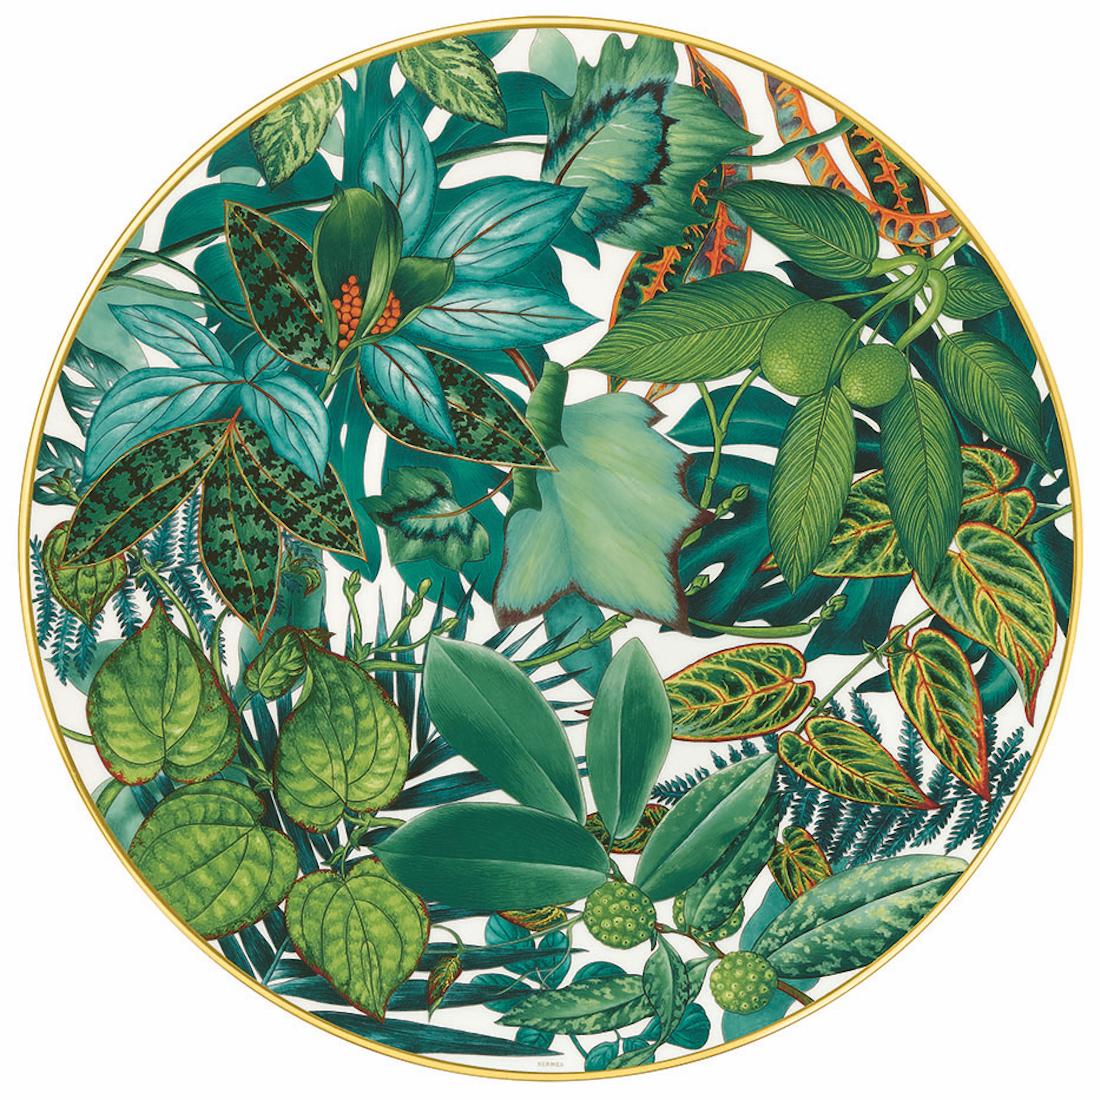 Hermes home collezione Passifolia tra botanica e arte